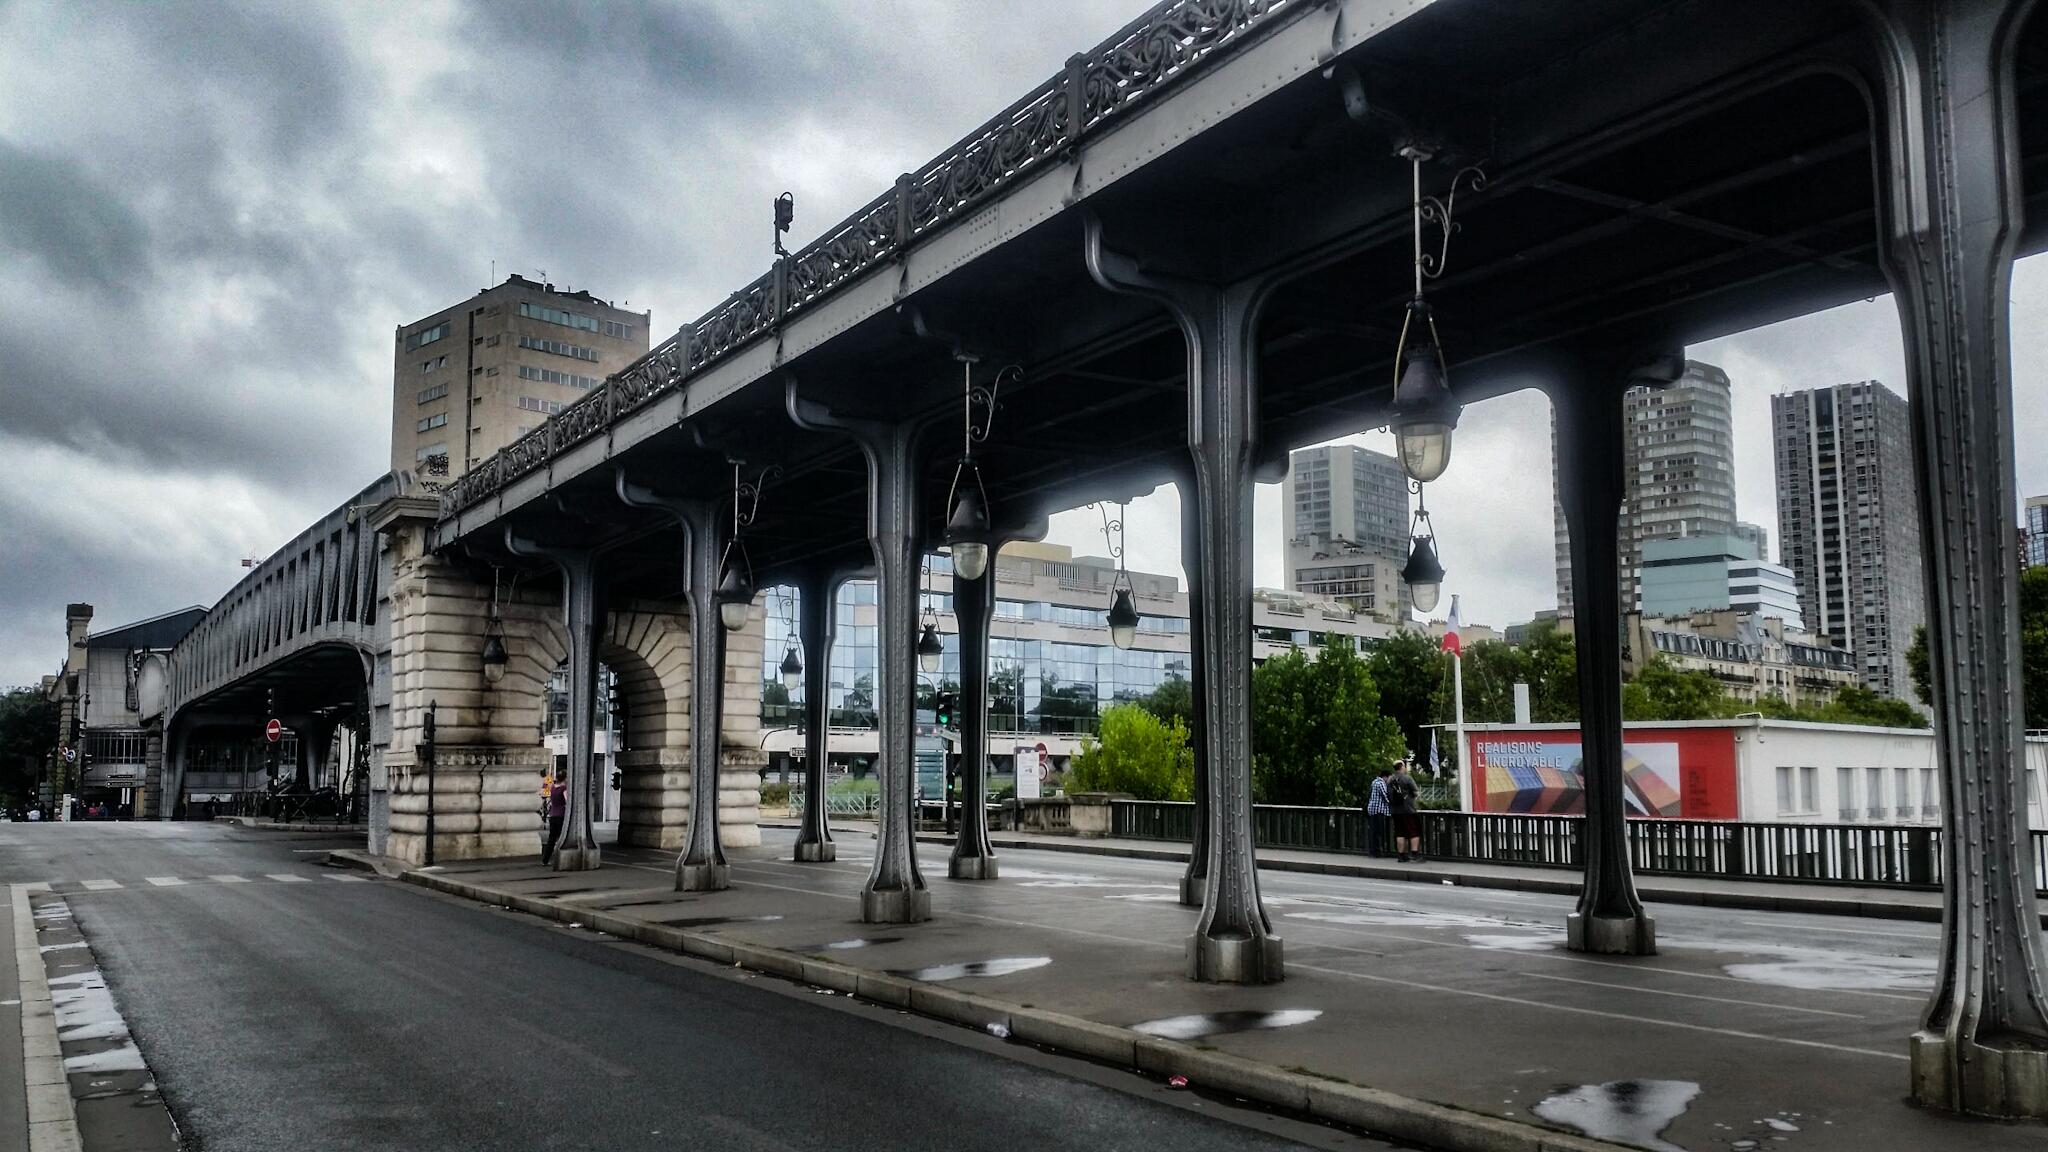 Le Pont de Bir-Hakeim (París)